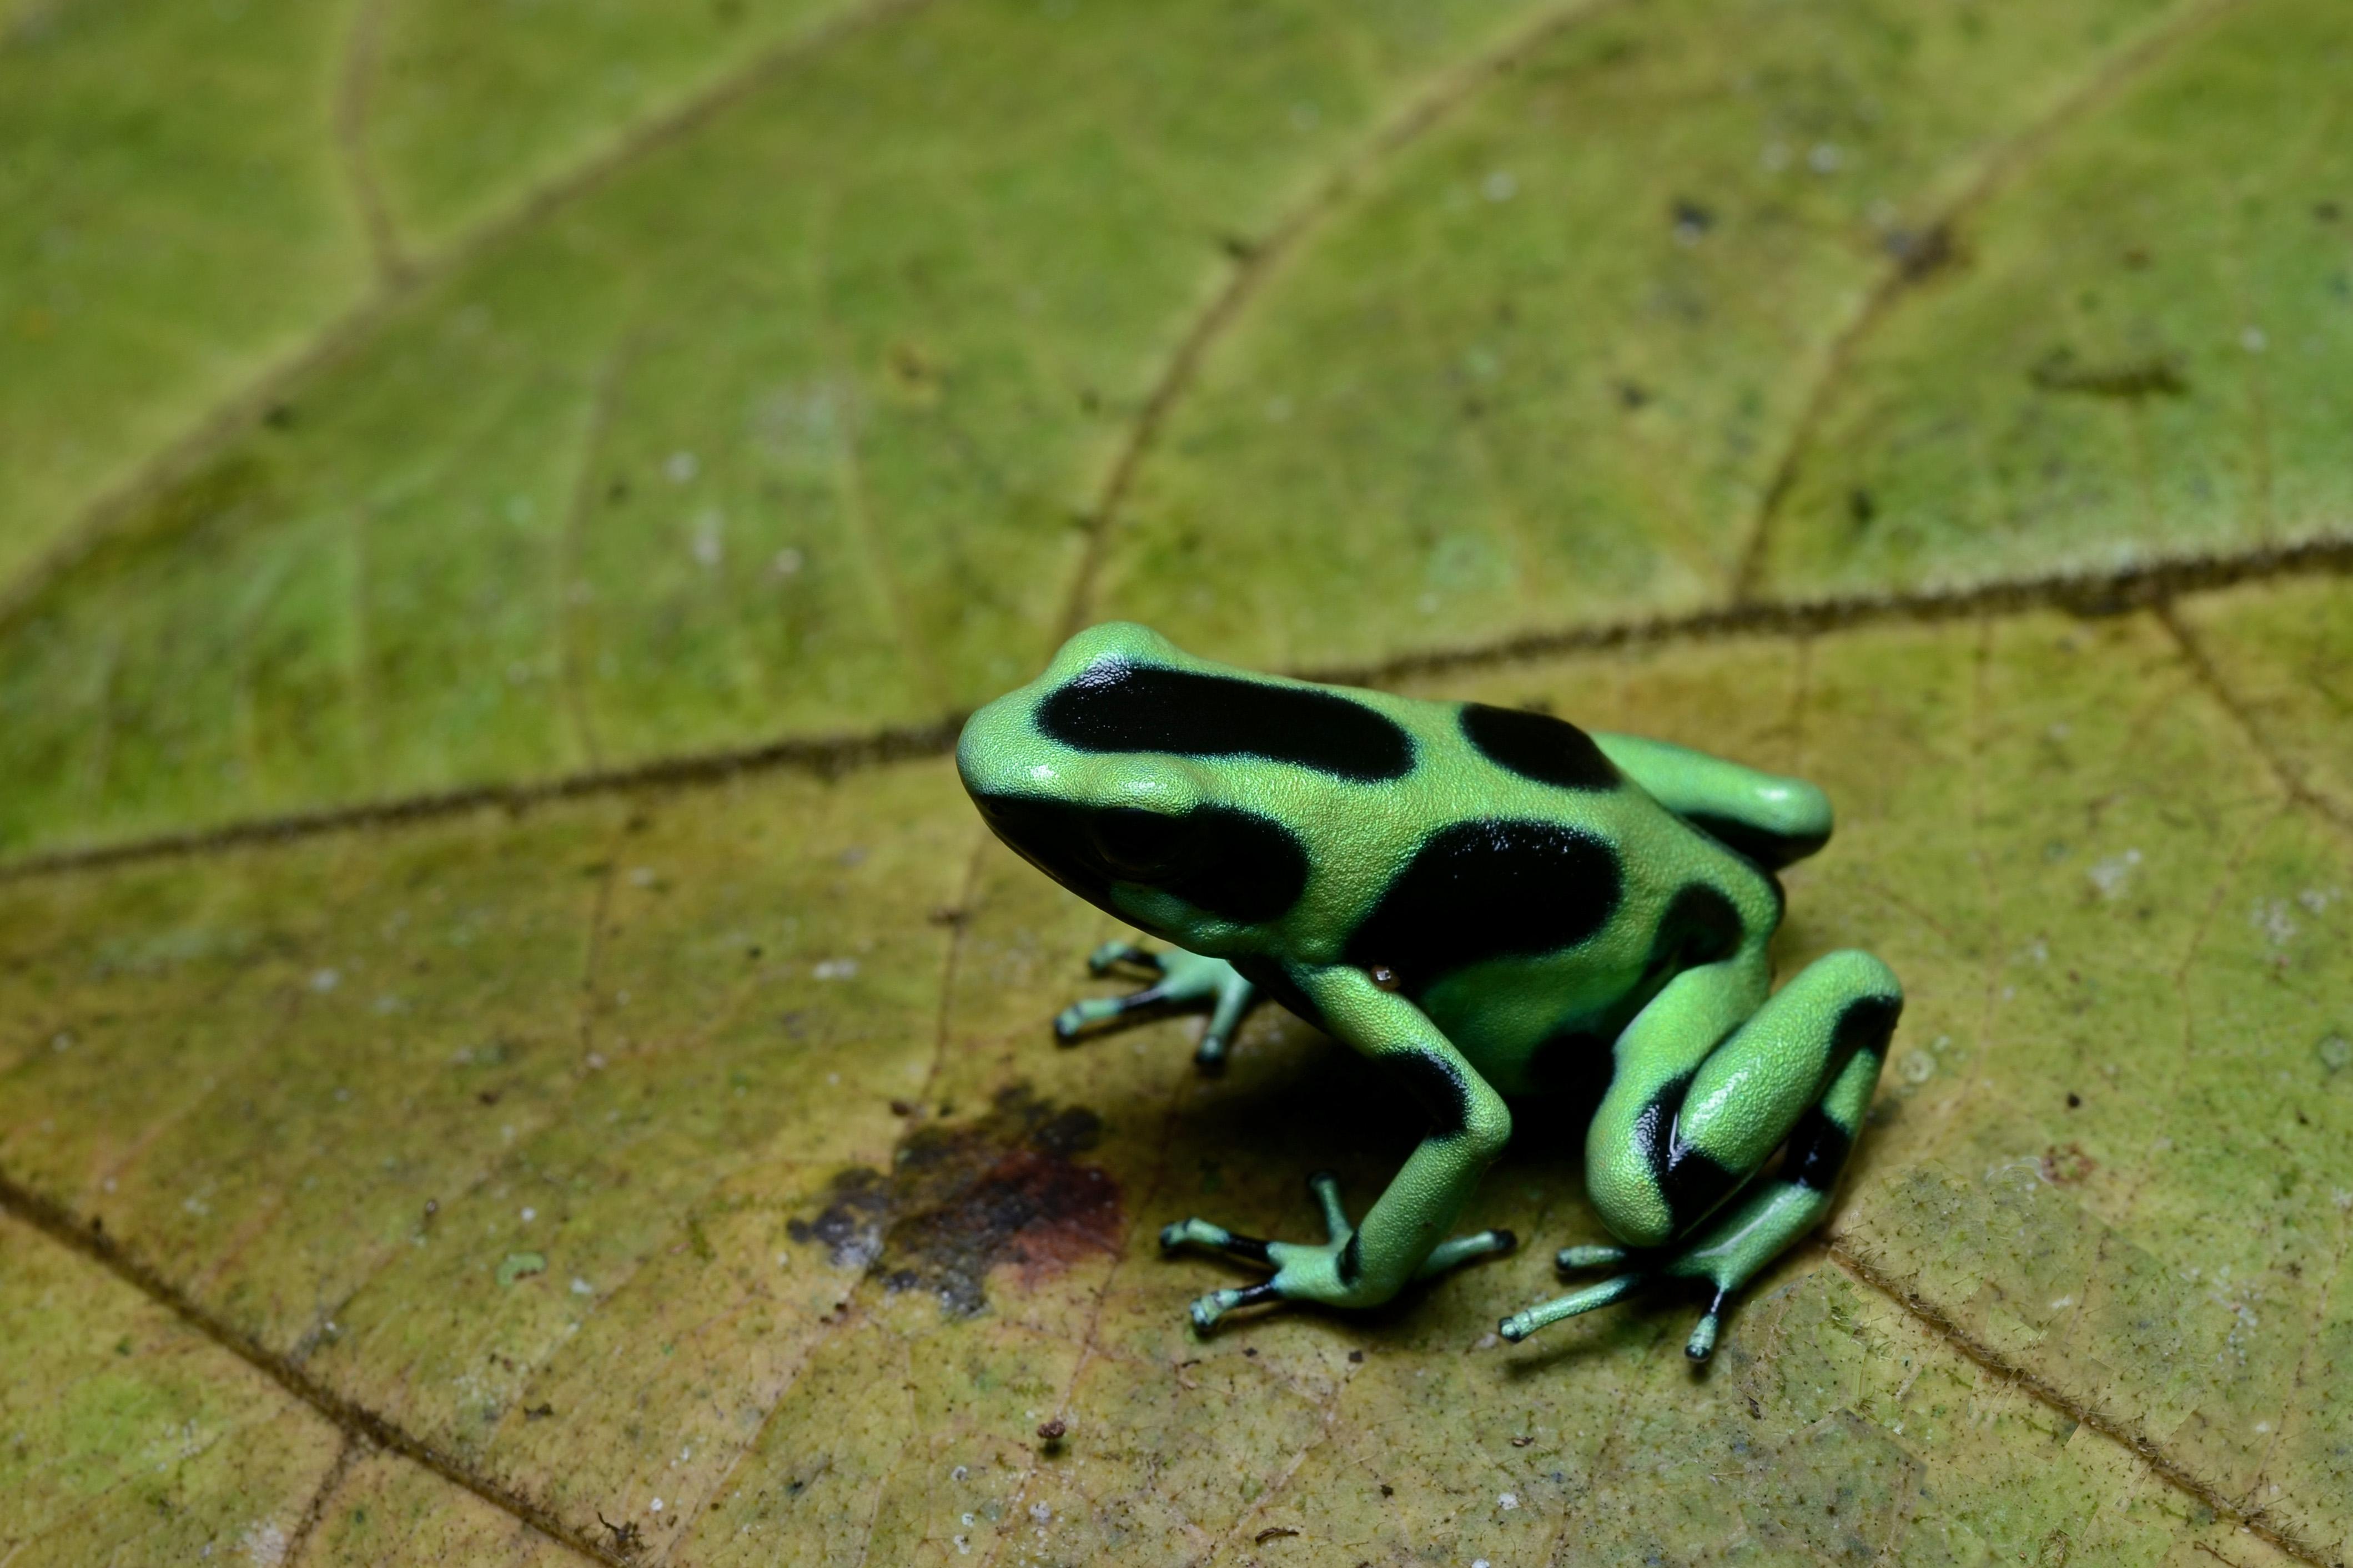 File:Flickr - ggallice - Green and black poison dart frog ...